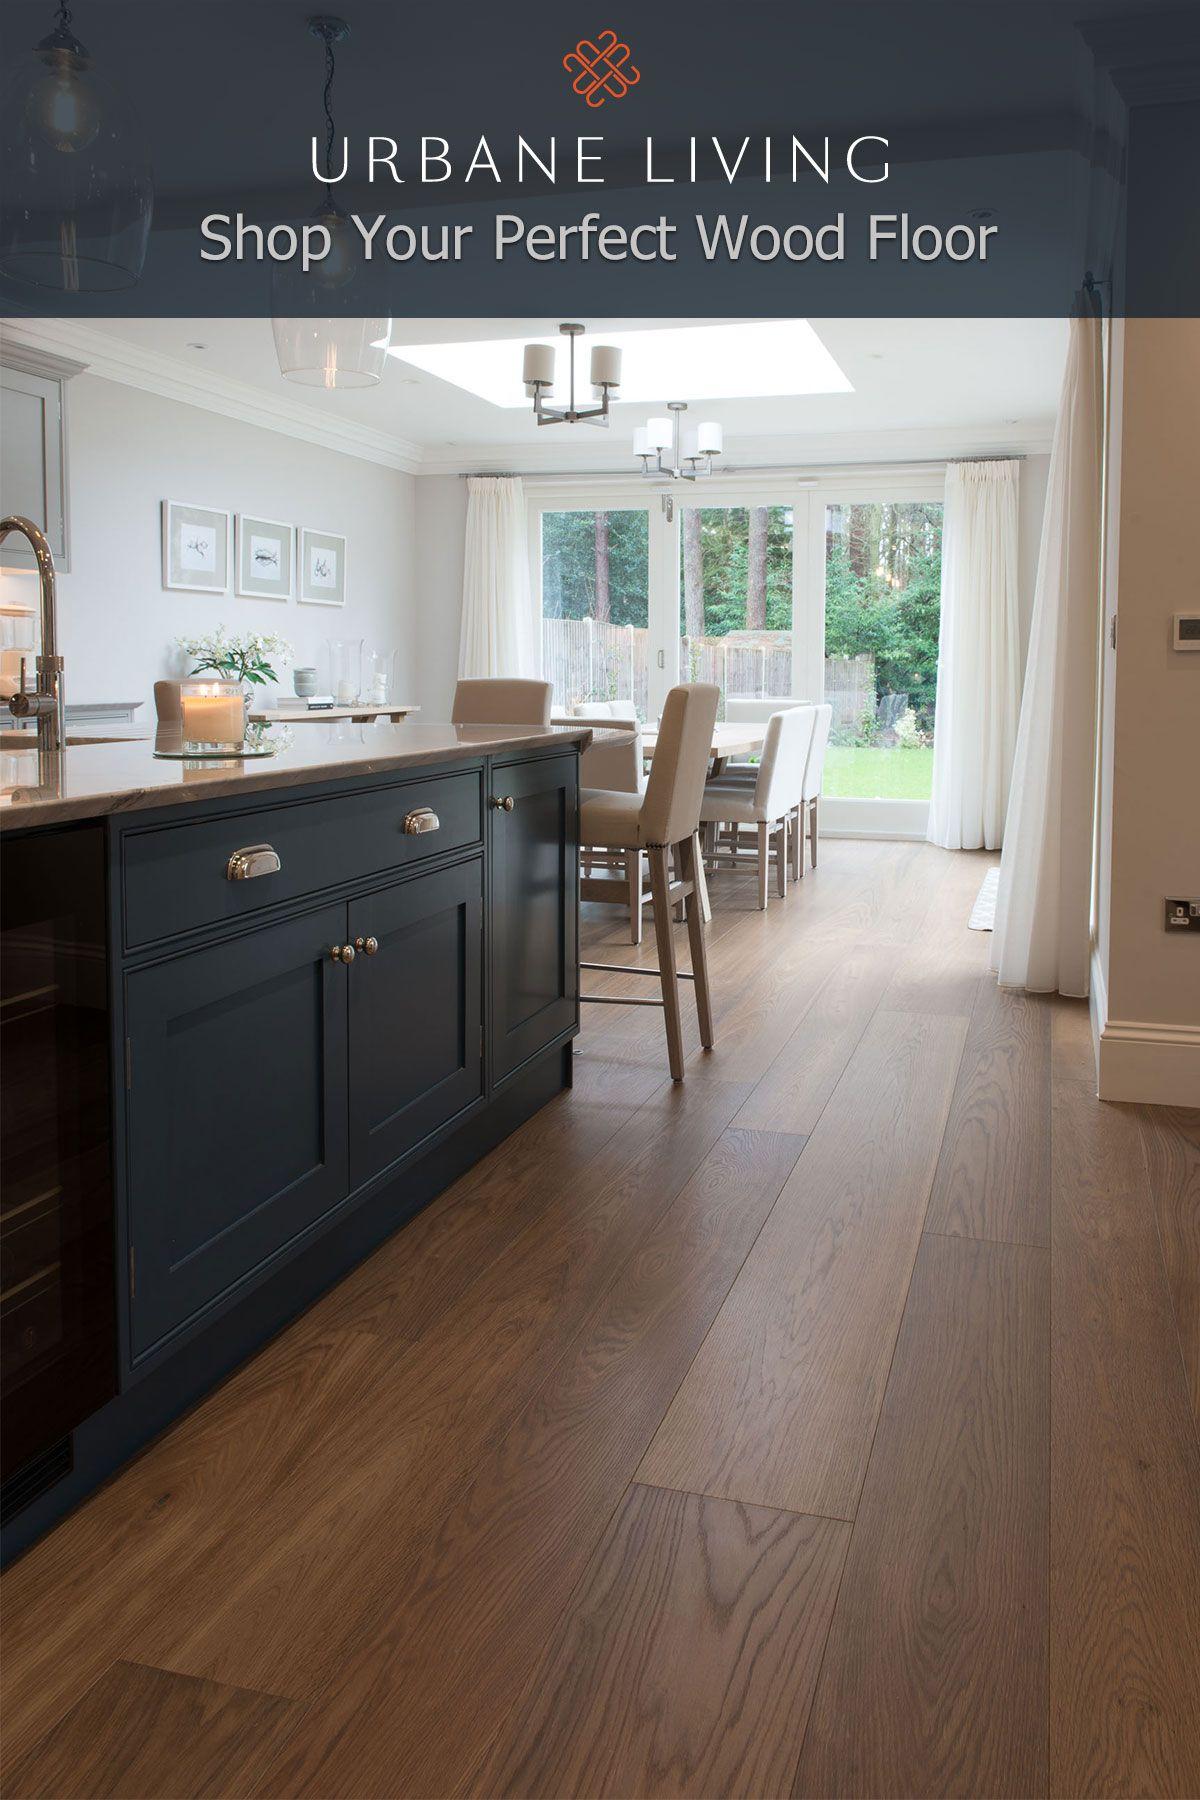 Meribel Oak Prime Grade Planks in mixed widths Interior